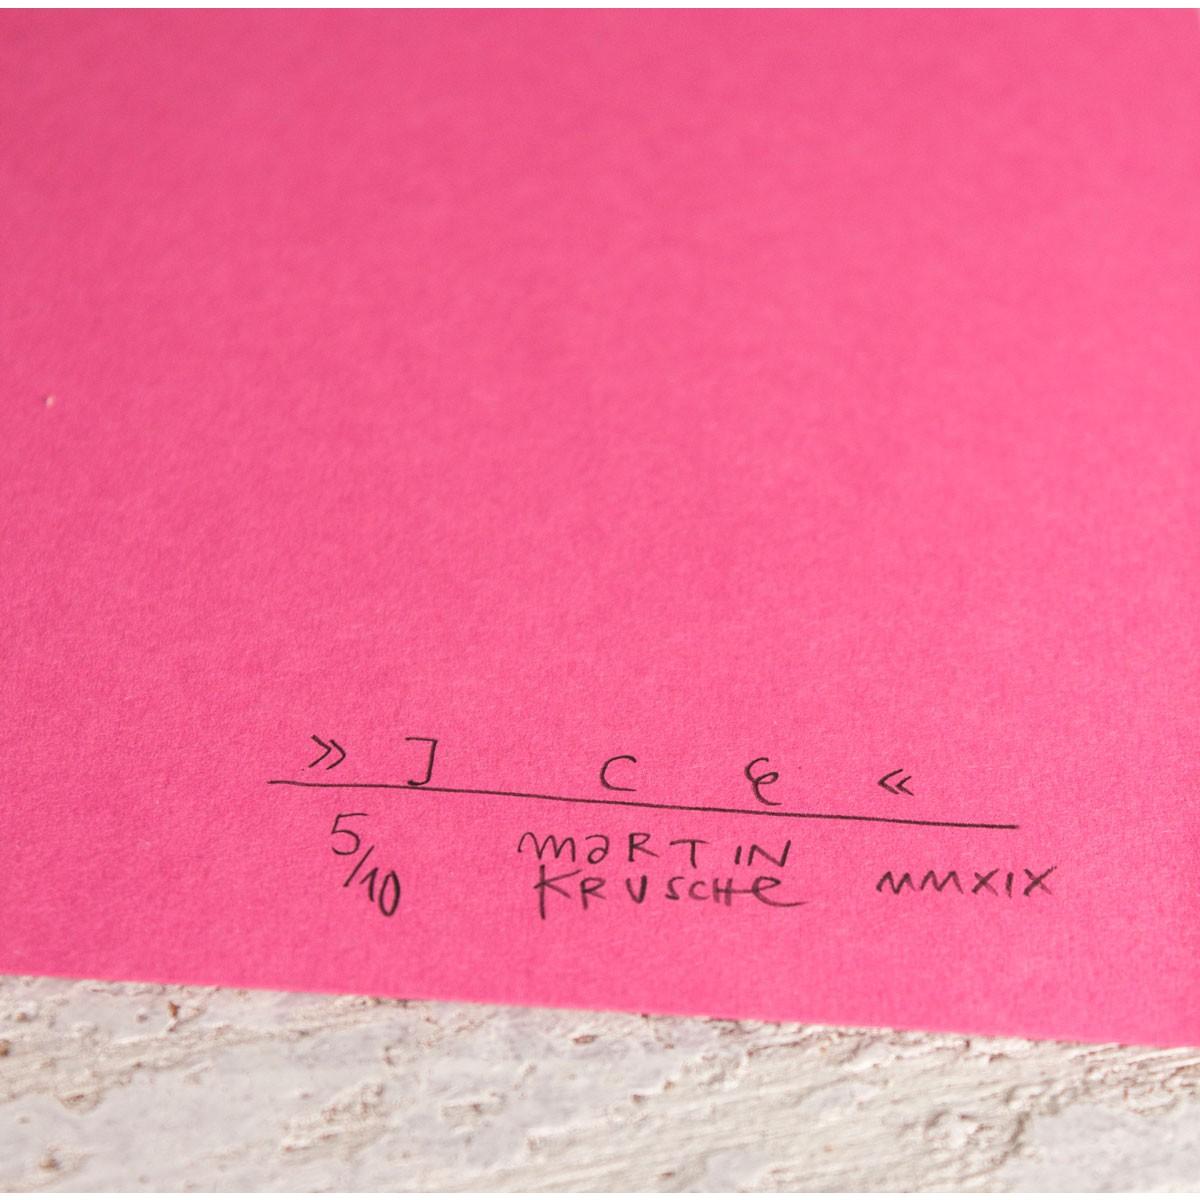 Stencil Artprint »Ice«, 50x70cm